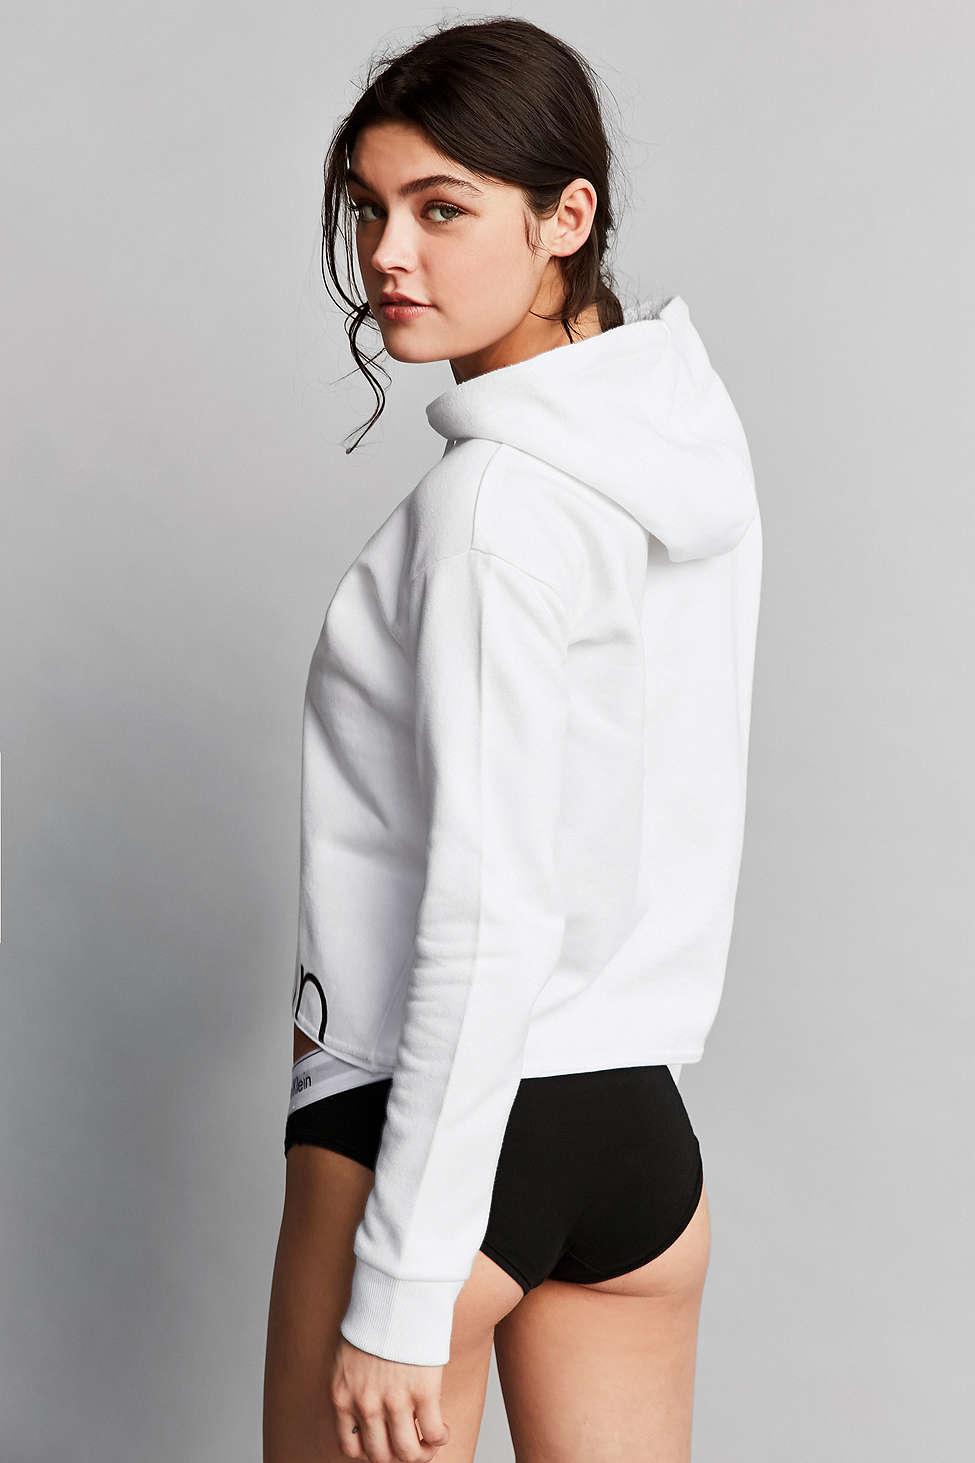 Calvin Klein For UO Flyaway Hoodie Sweatshirt - Urban